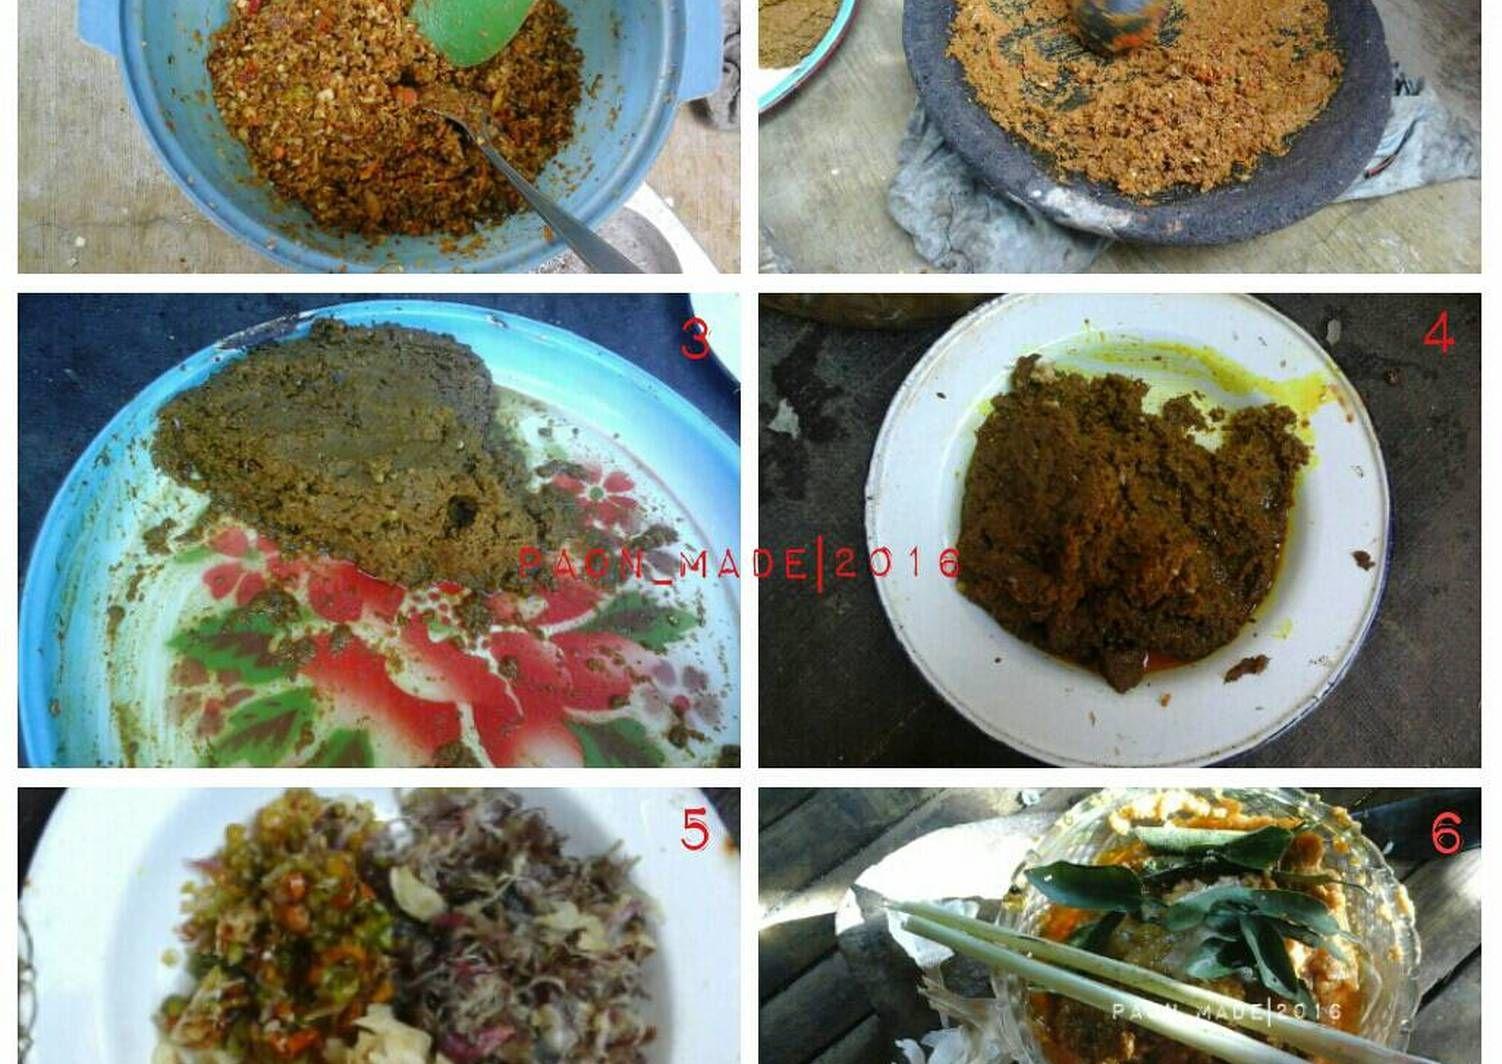 Resep Bumbu Bali Base Genep Oleh Paon Made Resep Resep Makanan Makanan Rempah